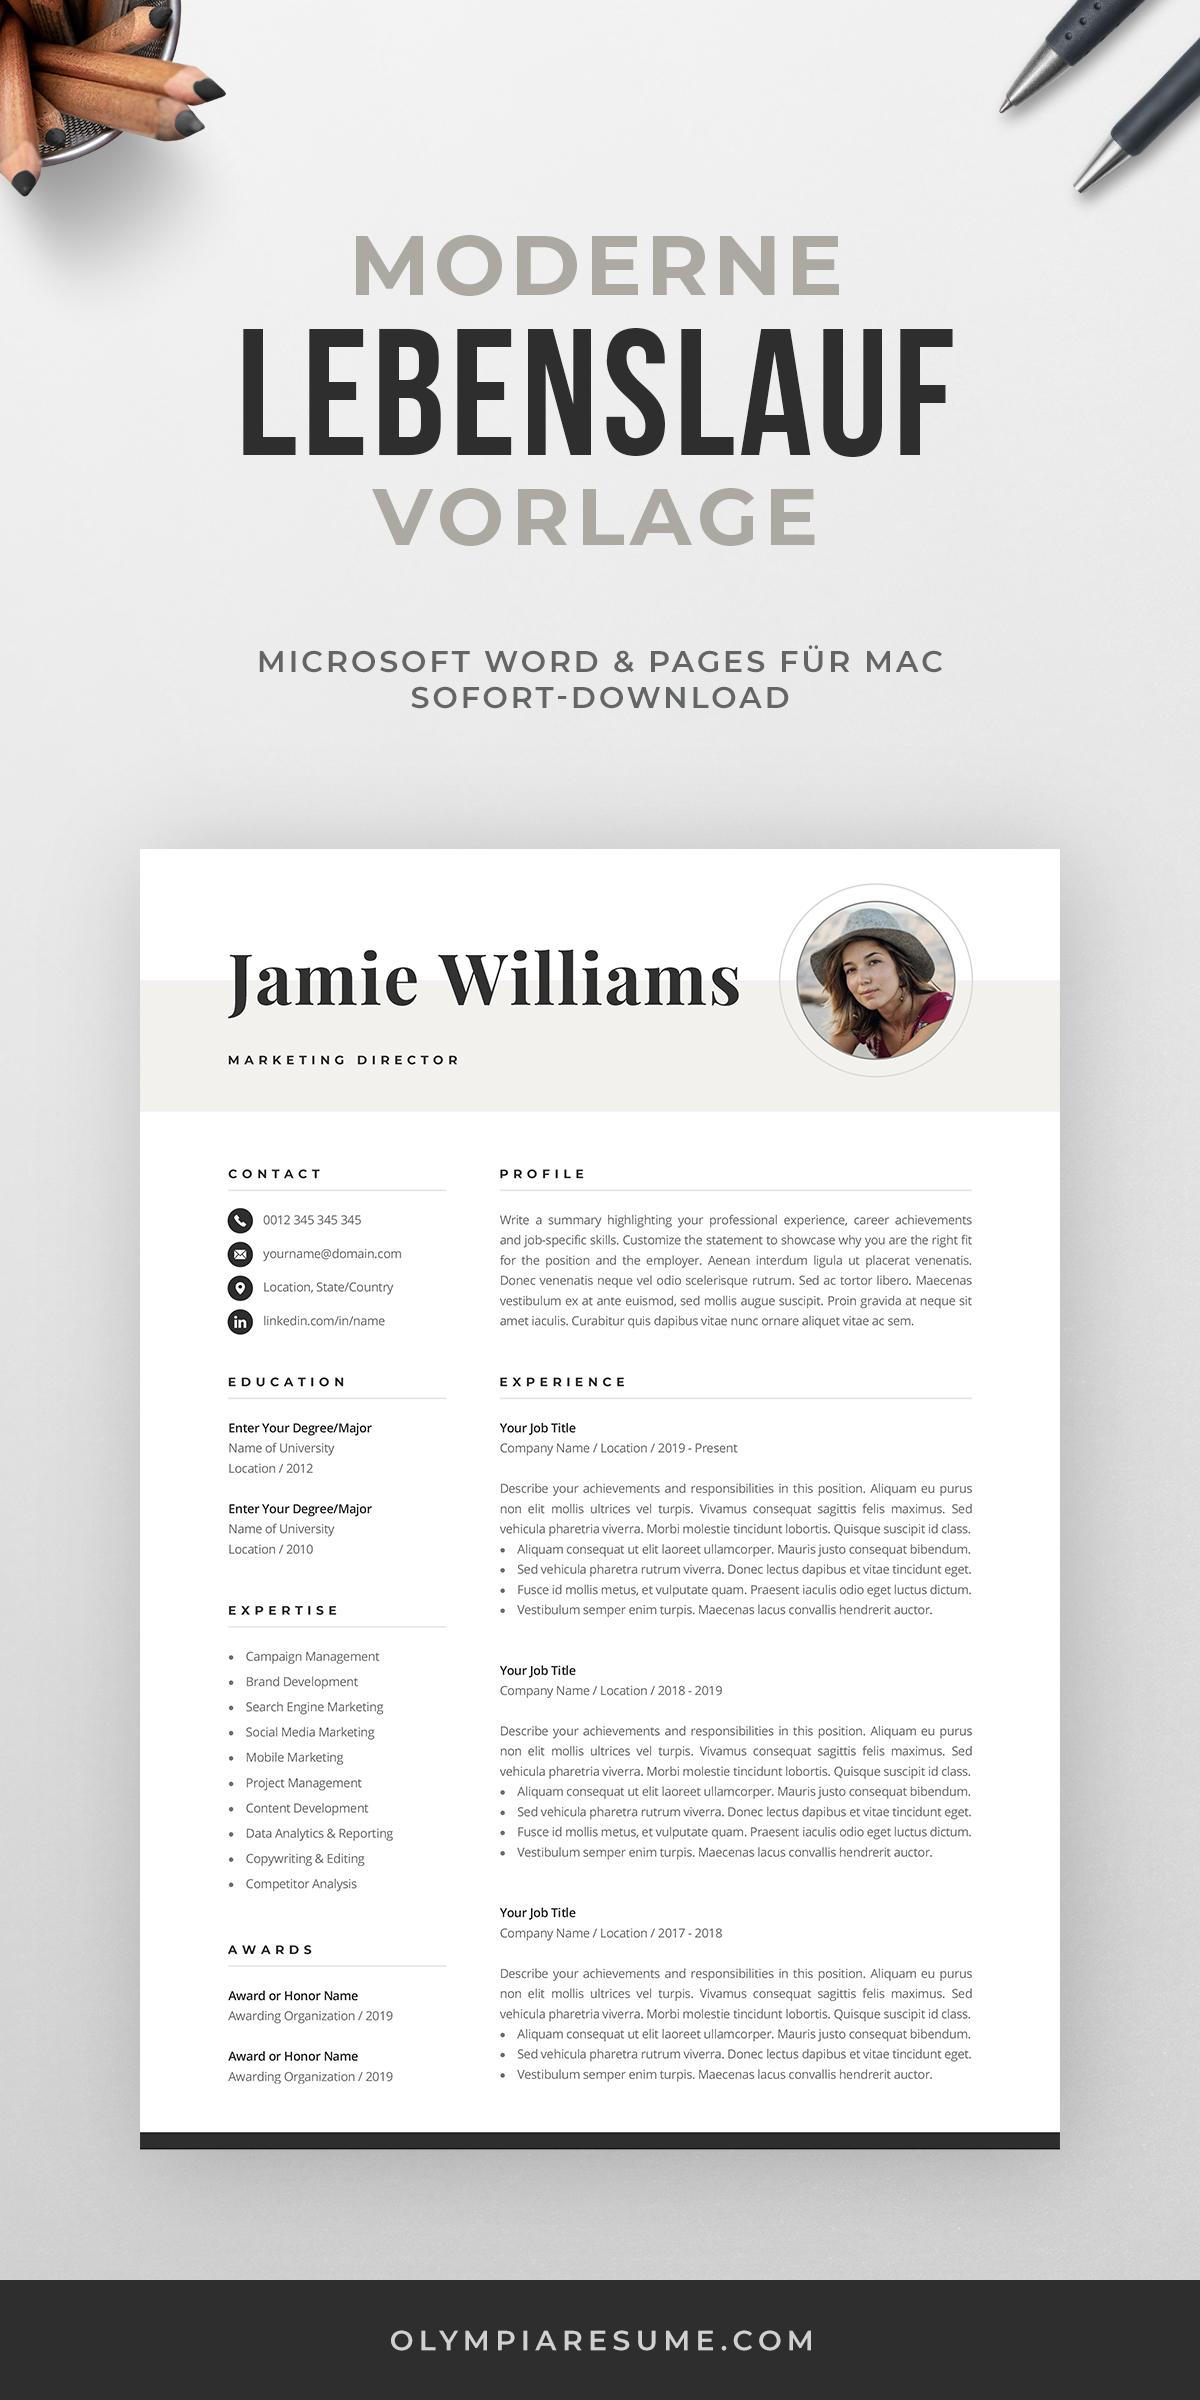 Creative Resume Template With Photo Elegant Design Modern Etsy In 2020 Creative Resume Templates One Page Resume Template Modern Resume Template